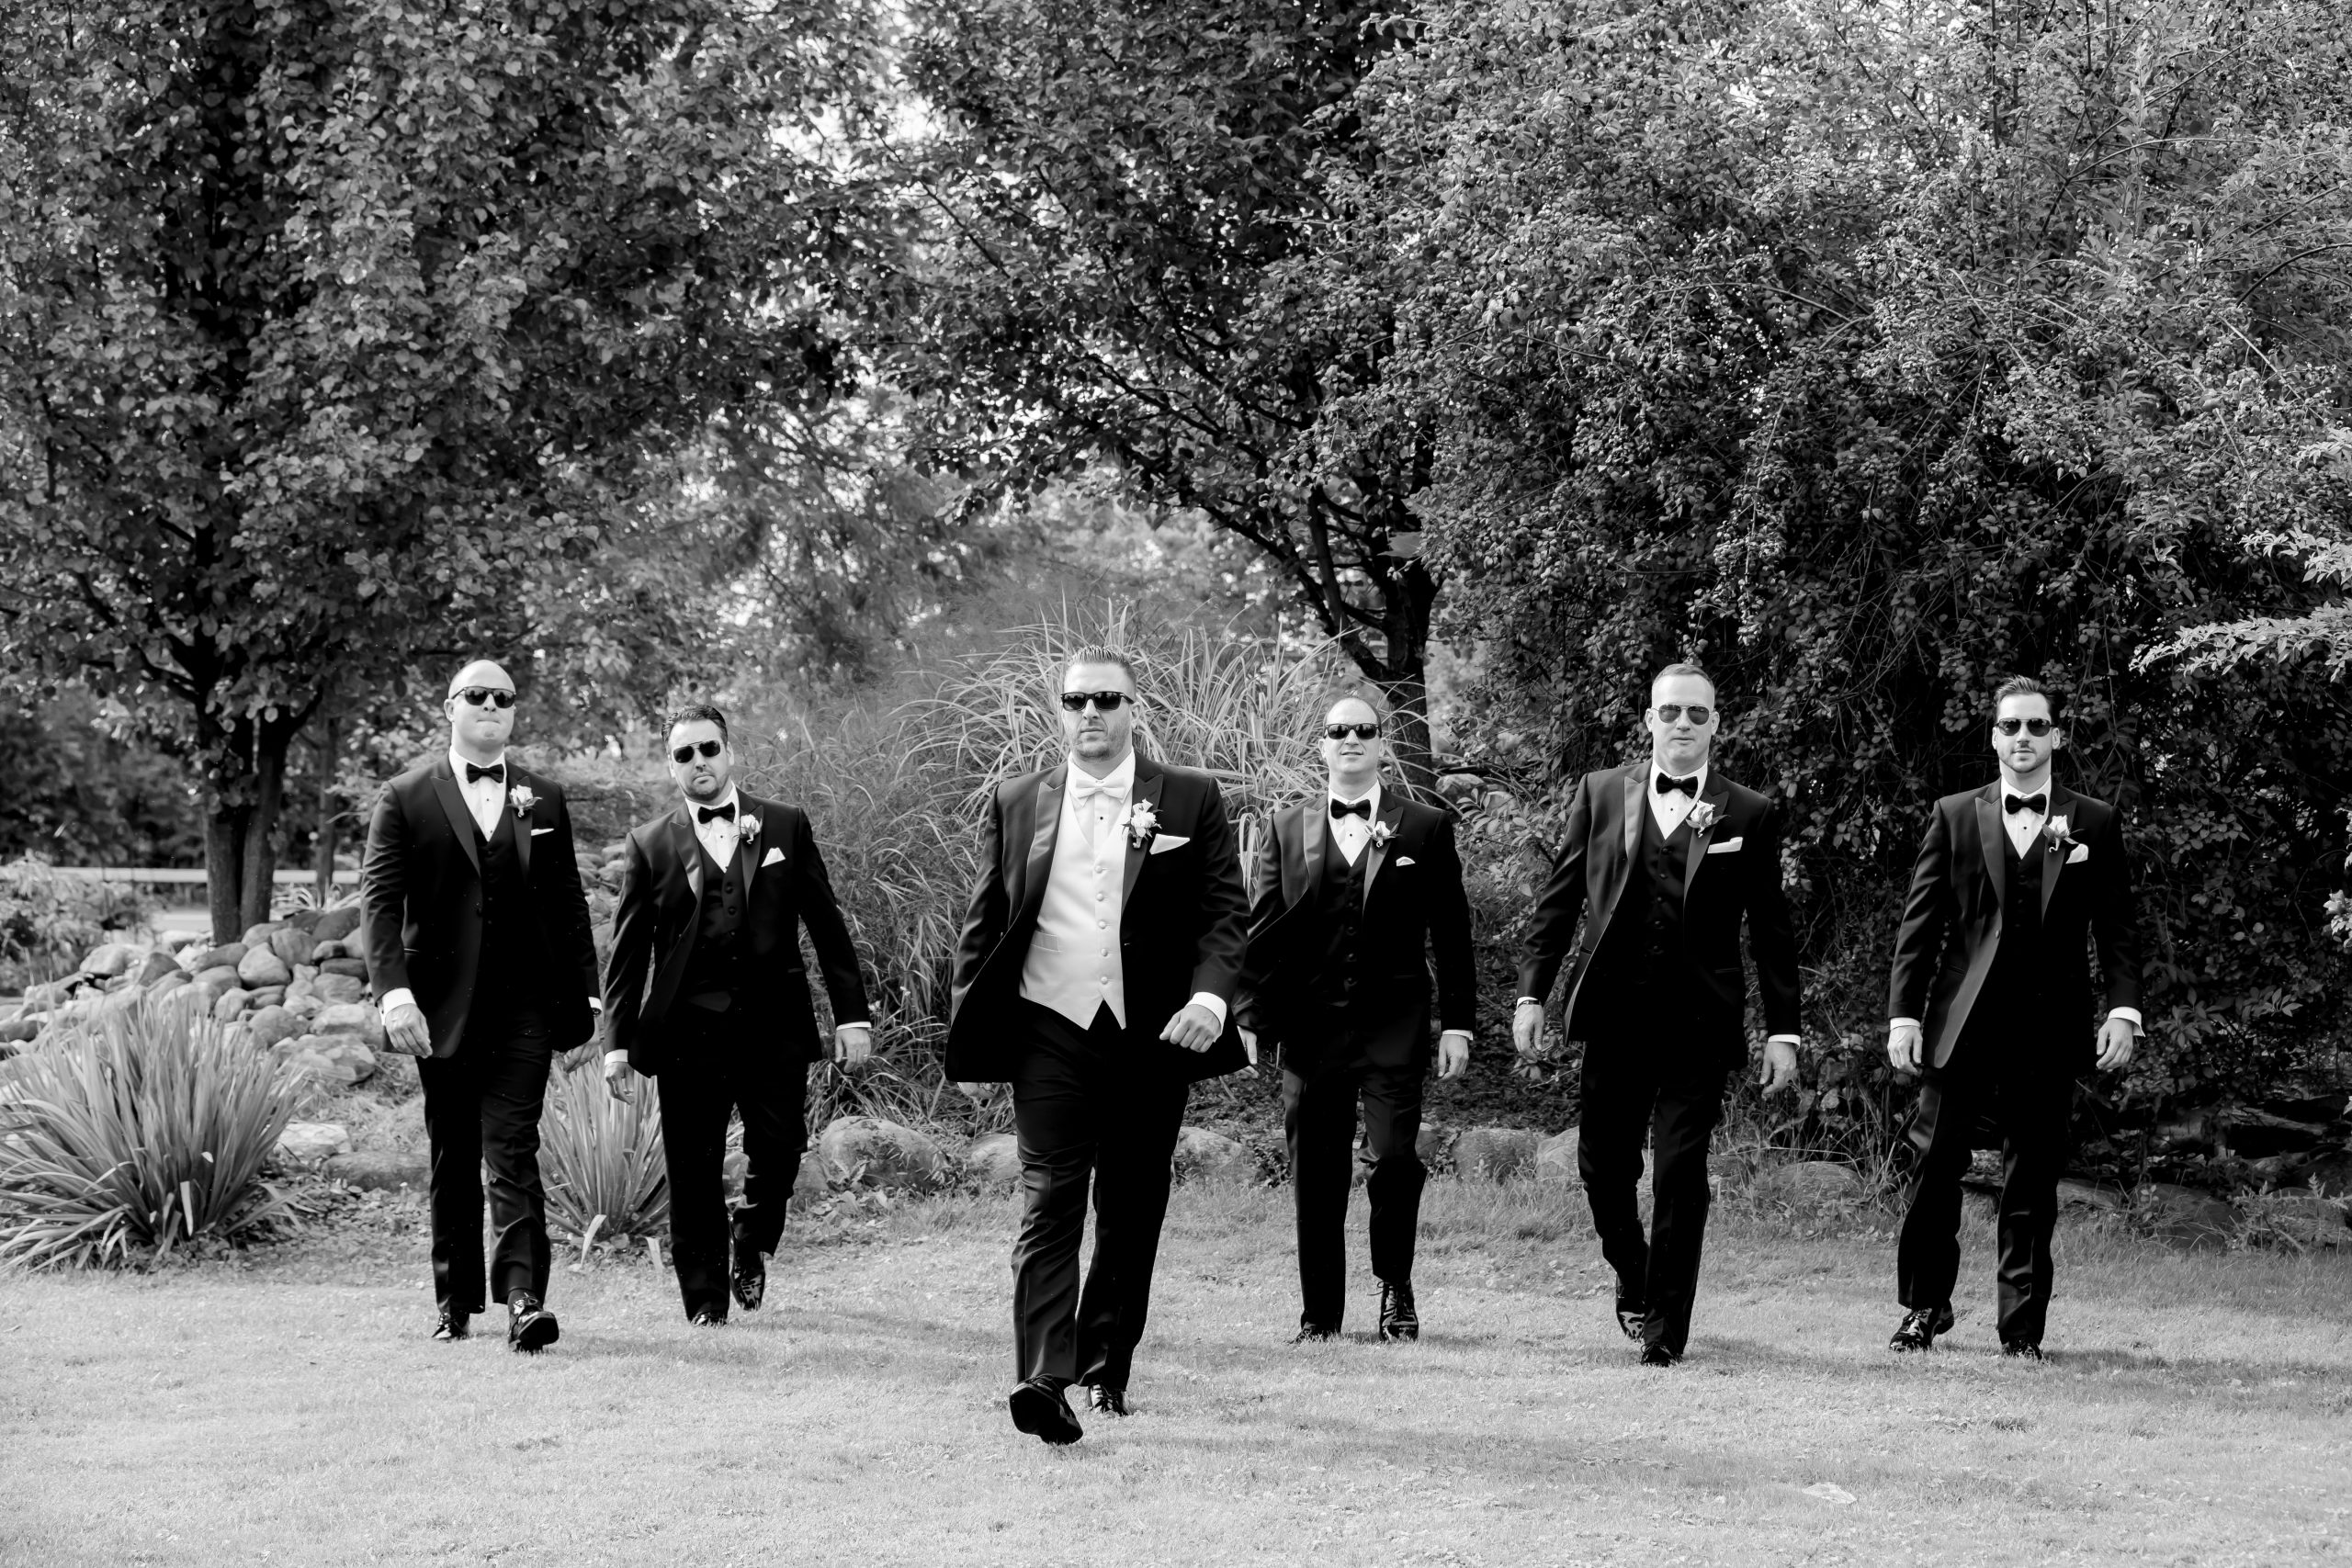 Victori_Rob_Mohawk River Country Club Wedding-16.jpg